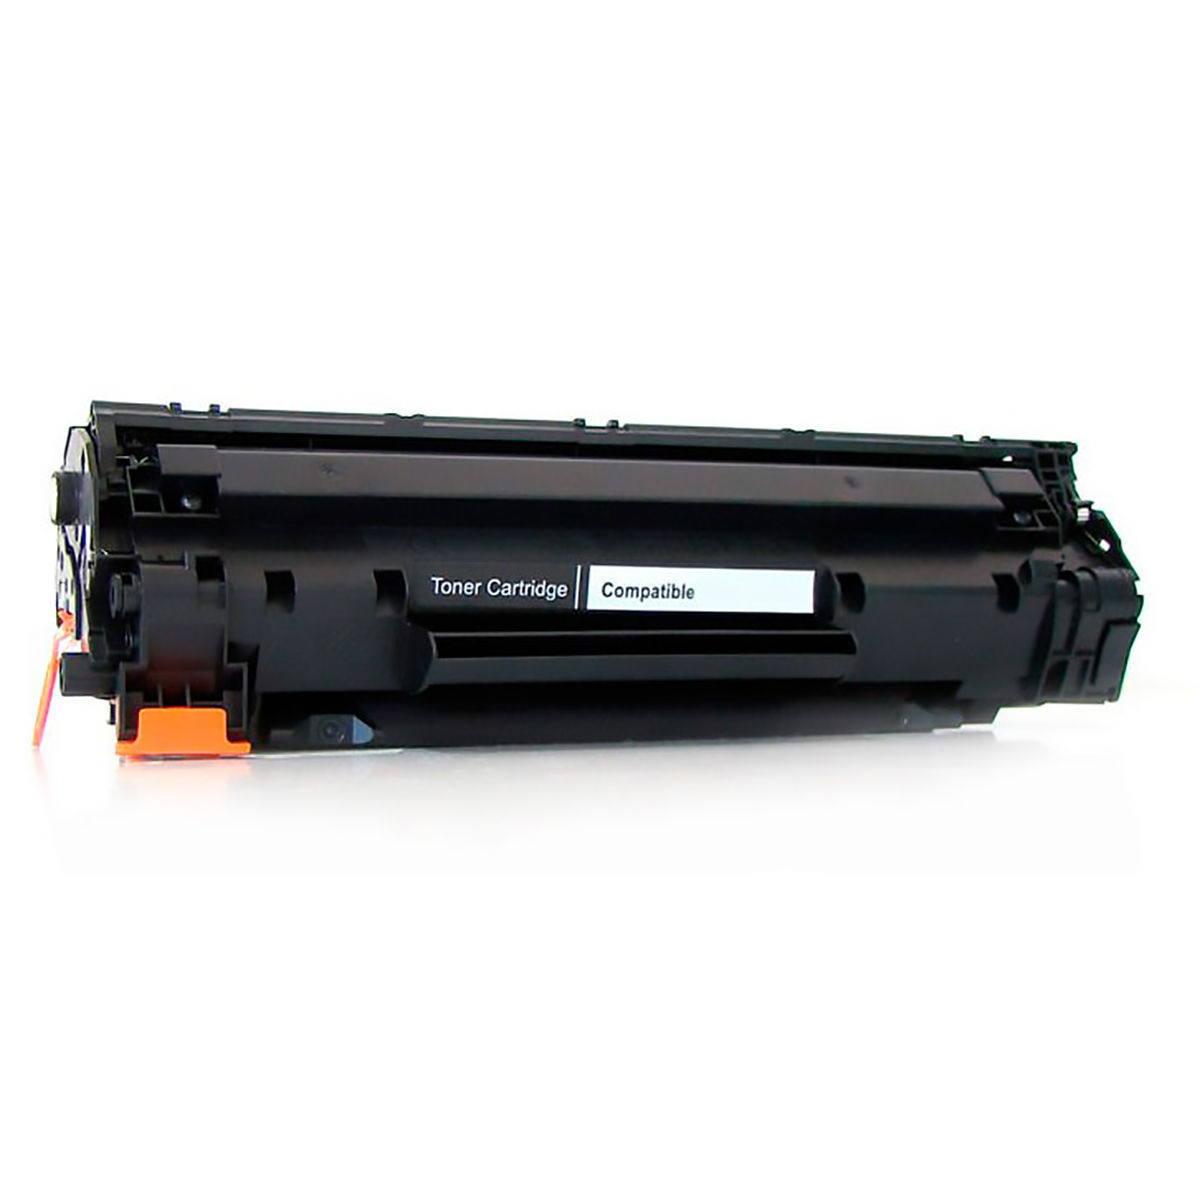 Compatível: Toner para impressora HP M127fw M127fn M127 M-127fw M-127fn M-127 / Preto / 1.500